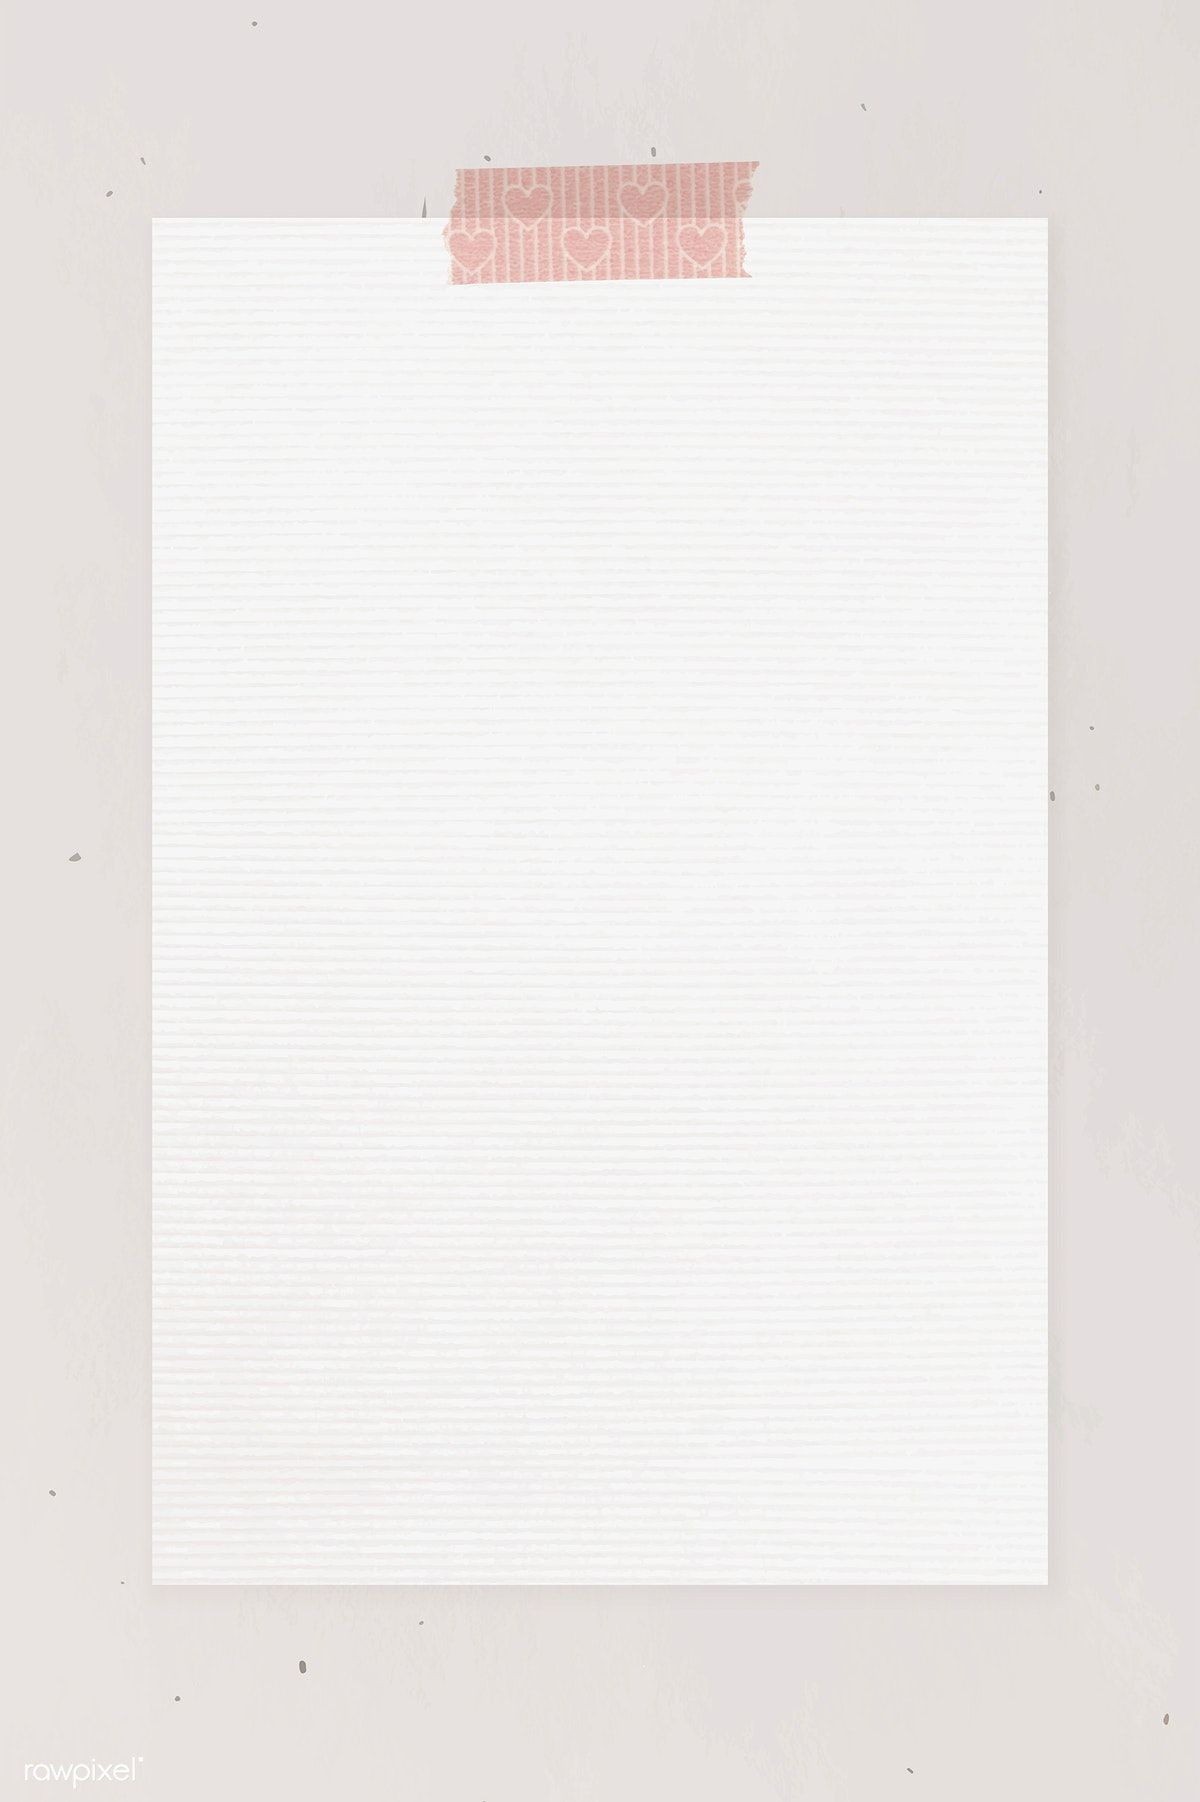 Blank Paper With Washi Tape Template Vector Free Image By Rawpixel Com Ningzk V Ideias Instagram Ideias Colagem Molduras Para Fotos Montagens